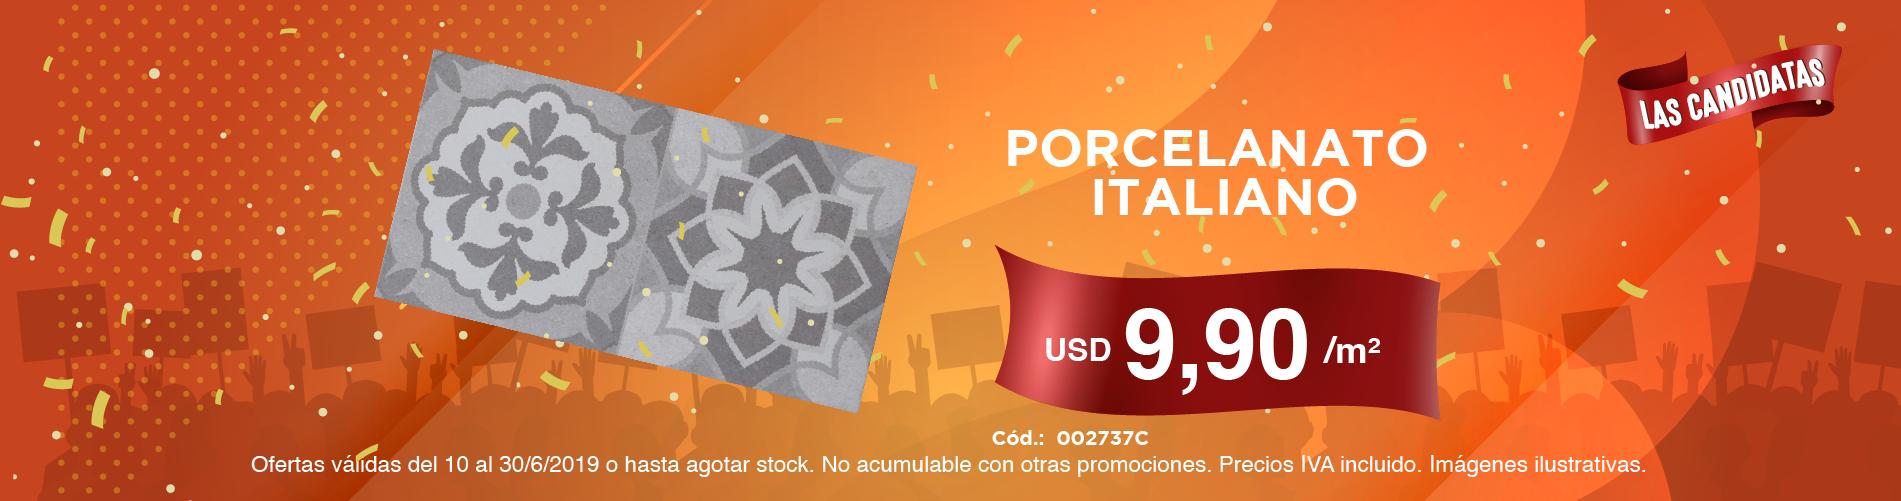 candidatas porcelanato italiano